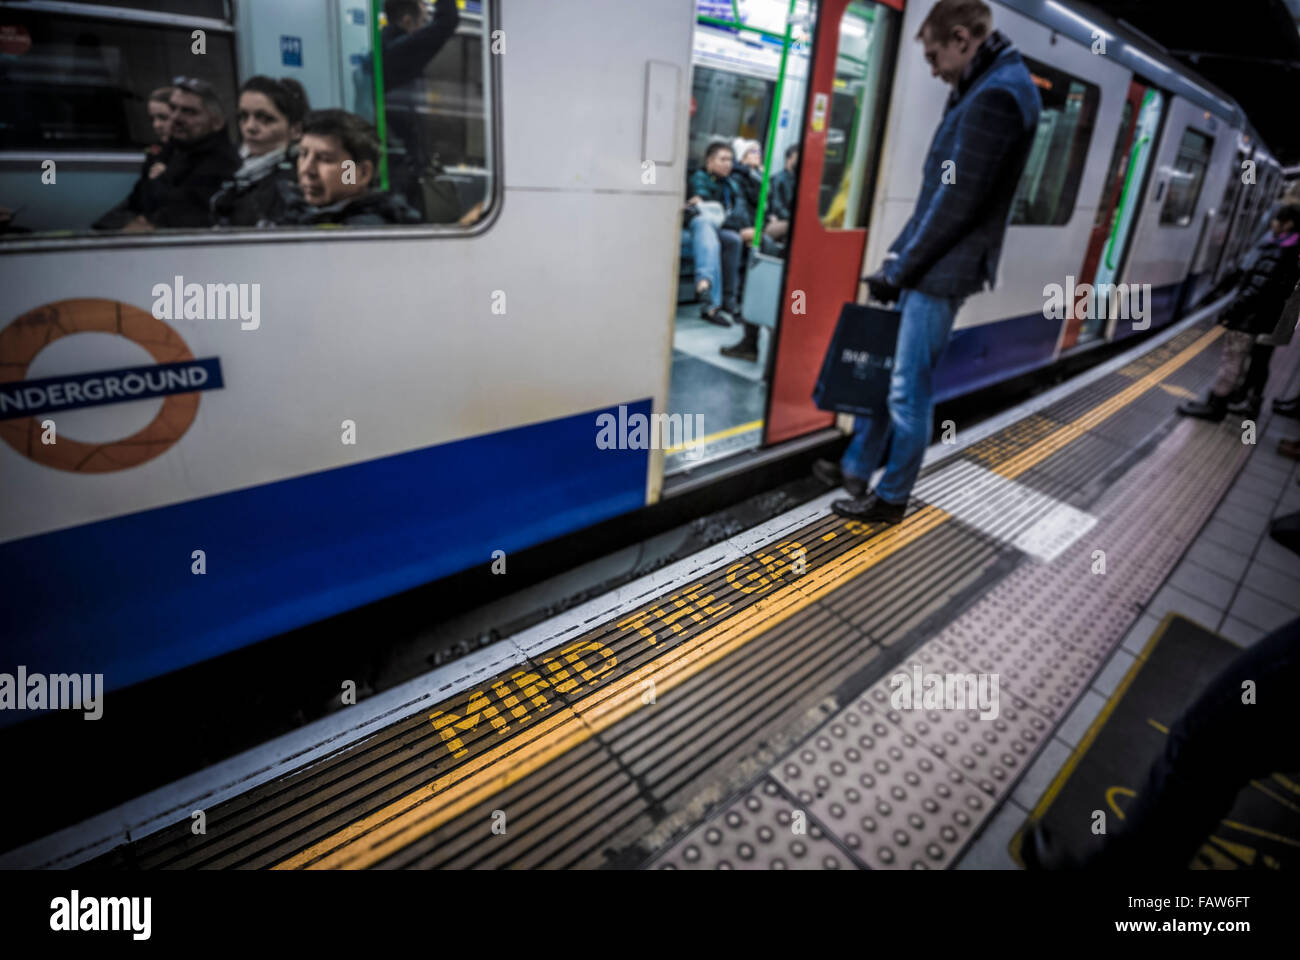 MIND THE GAP warning. London underground station with tube train and platform Stock Photo